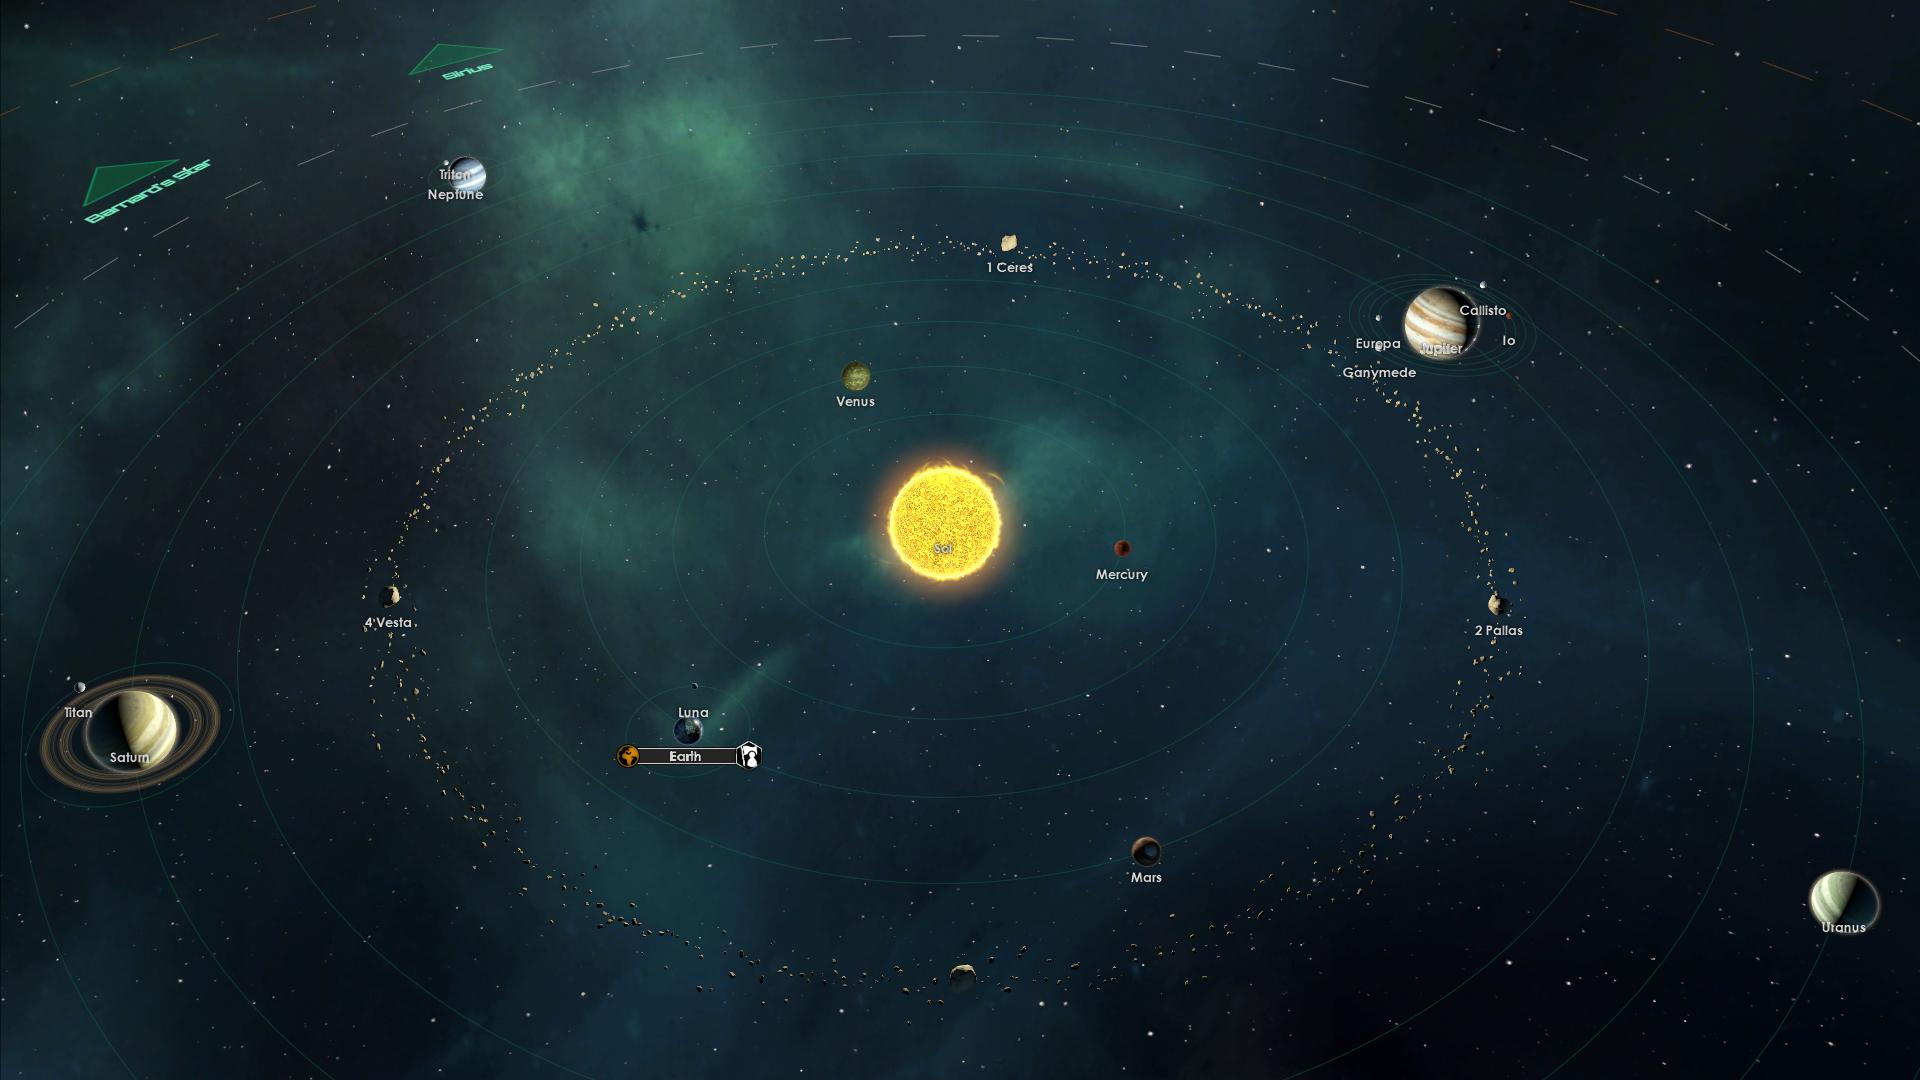 stellaris_dev_diary_02_02_20120928_sol_system.jpg